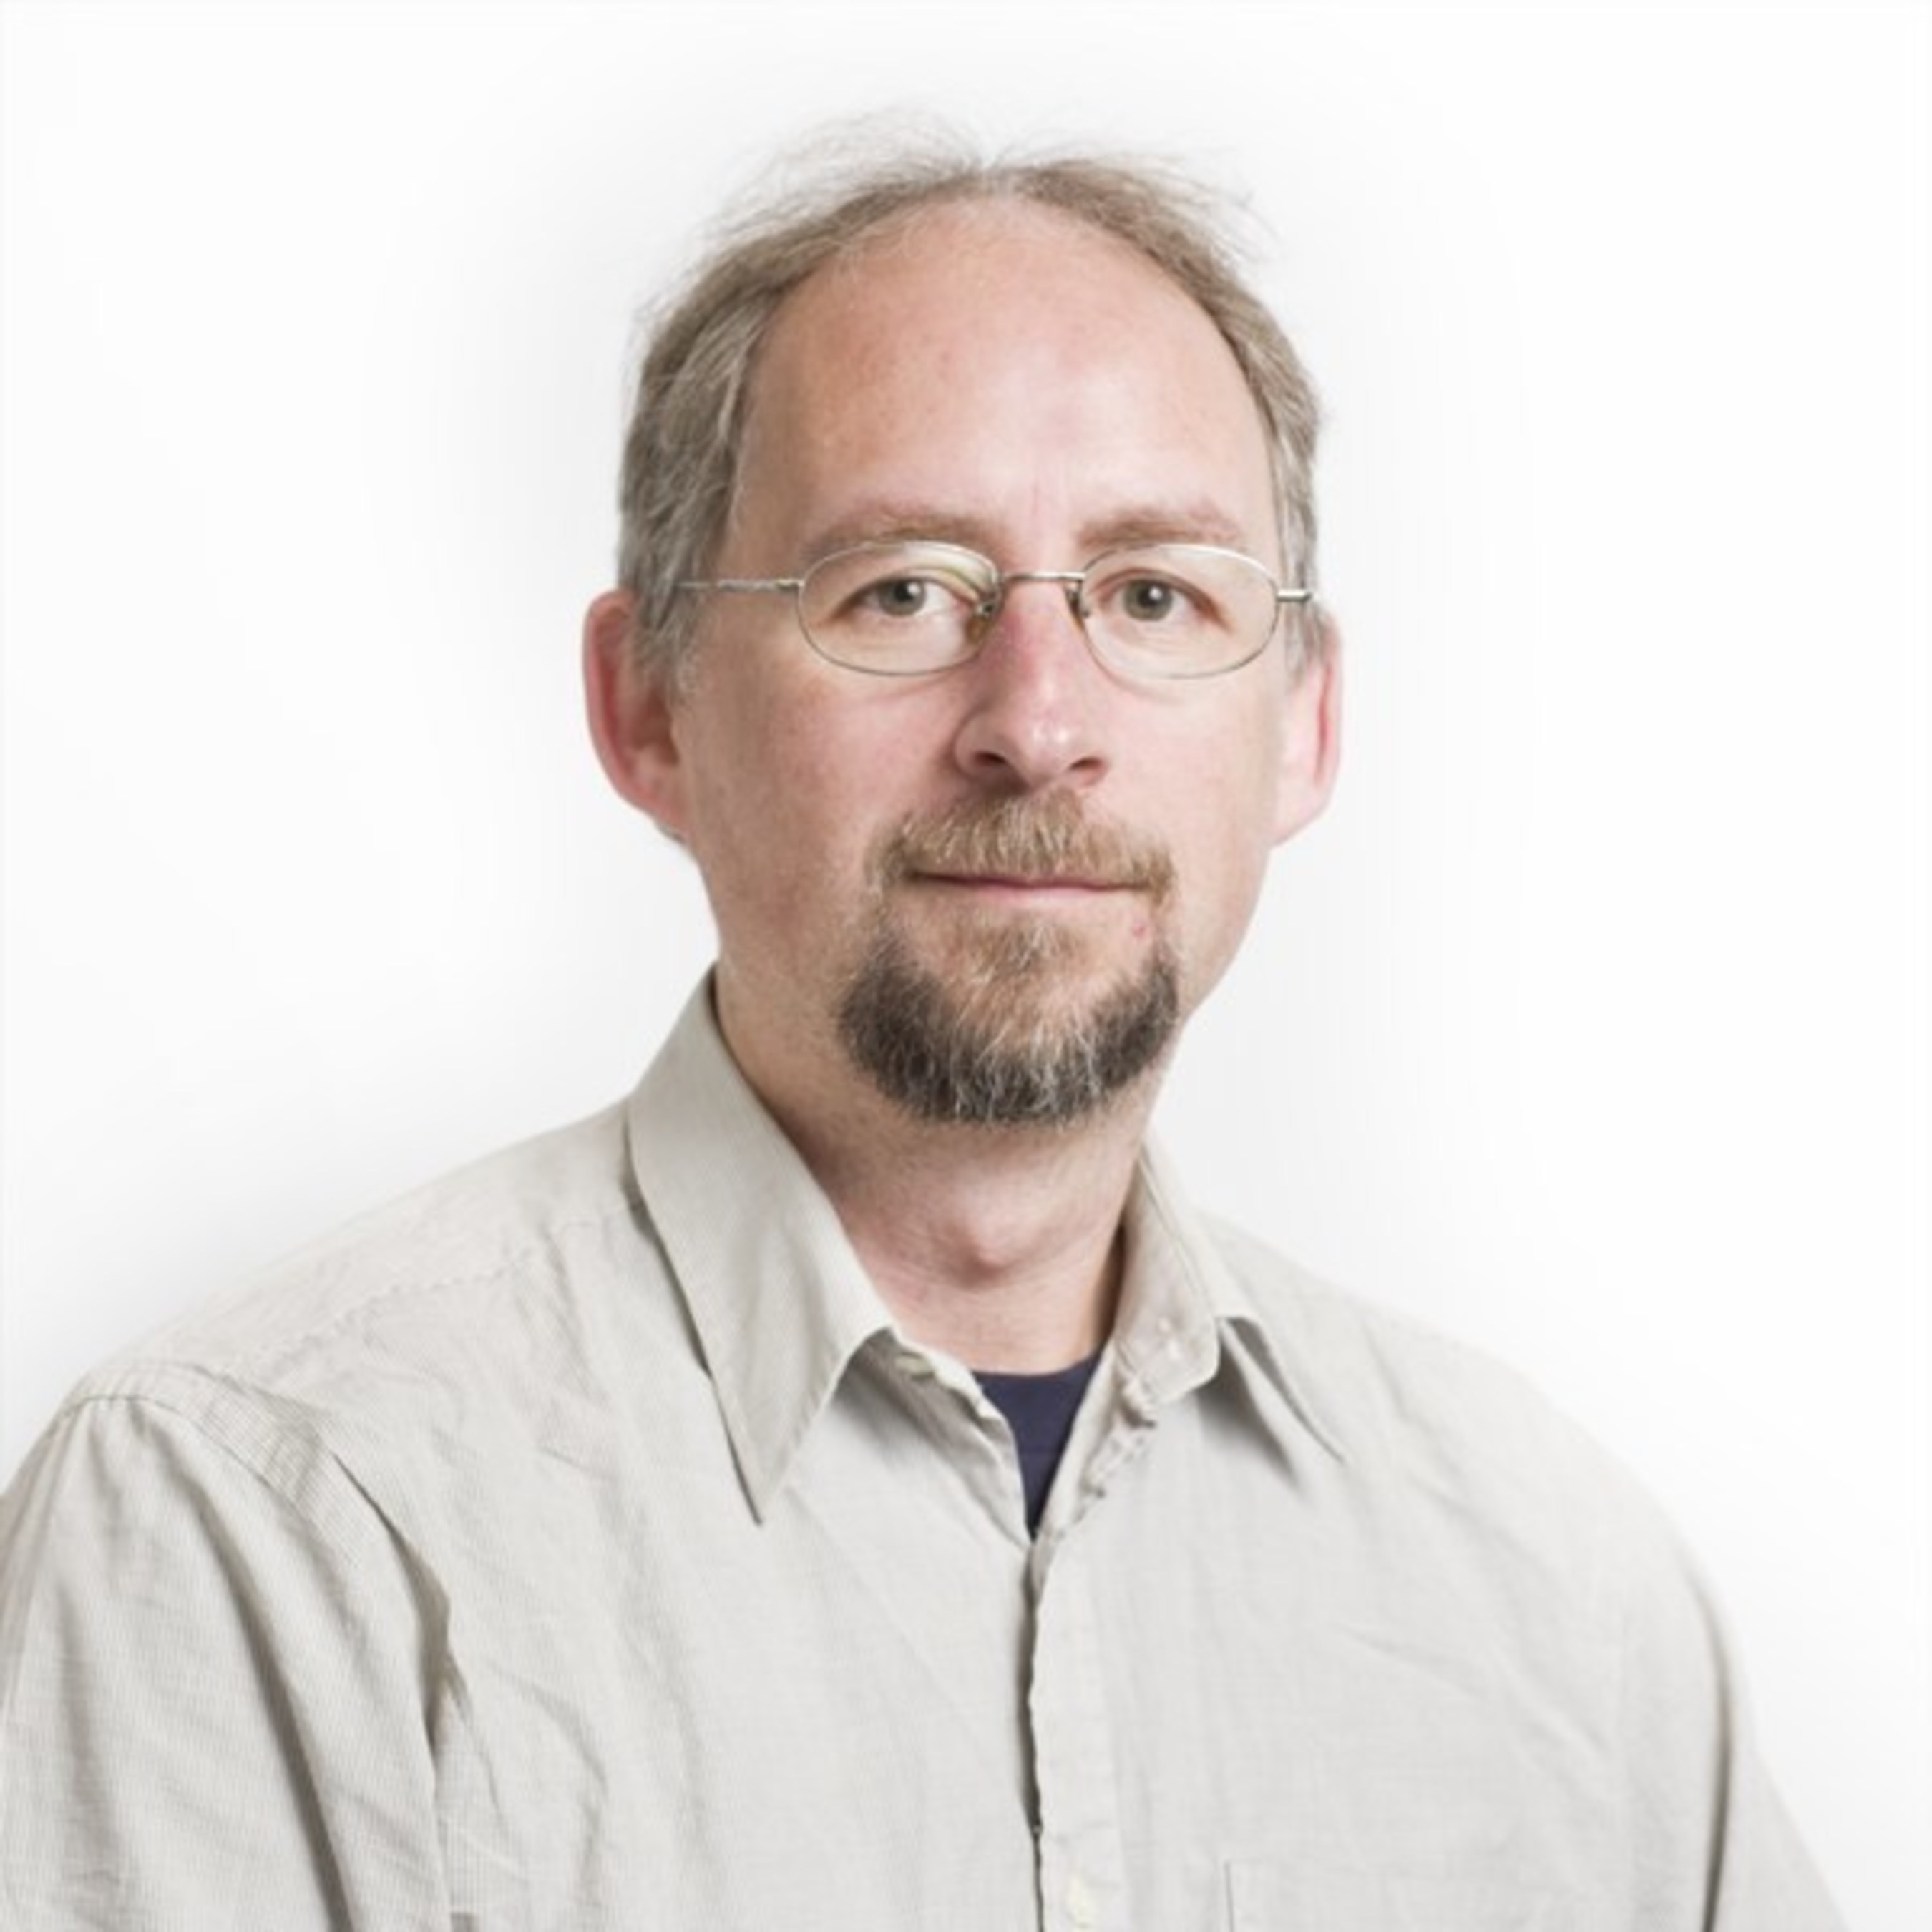 Dr. Adam Back, CEO, Blockstream